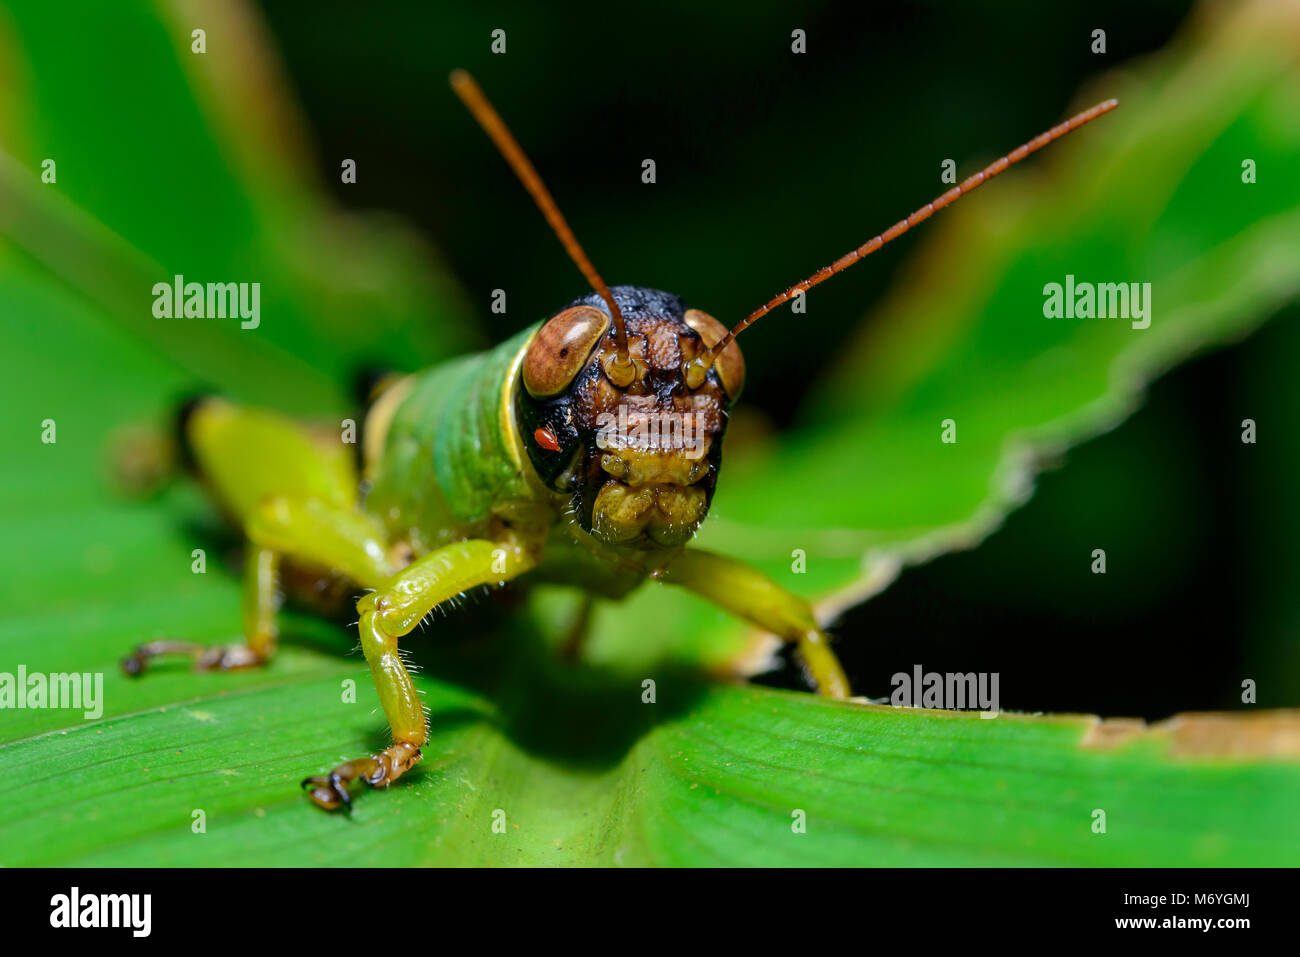 Grüne Heuschrecke, Orthoptera (Bestellung), Caelifera (Unterordnung), Costa Rica, Carara National Park Stockbild